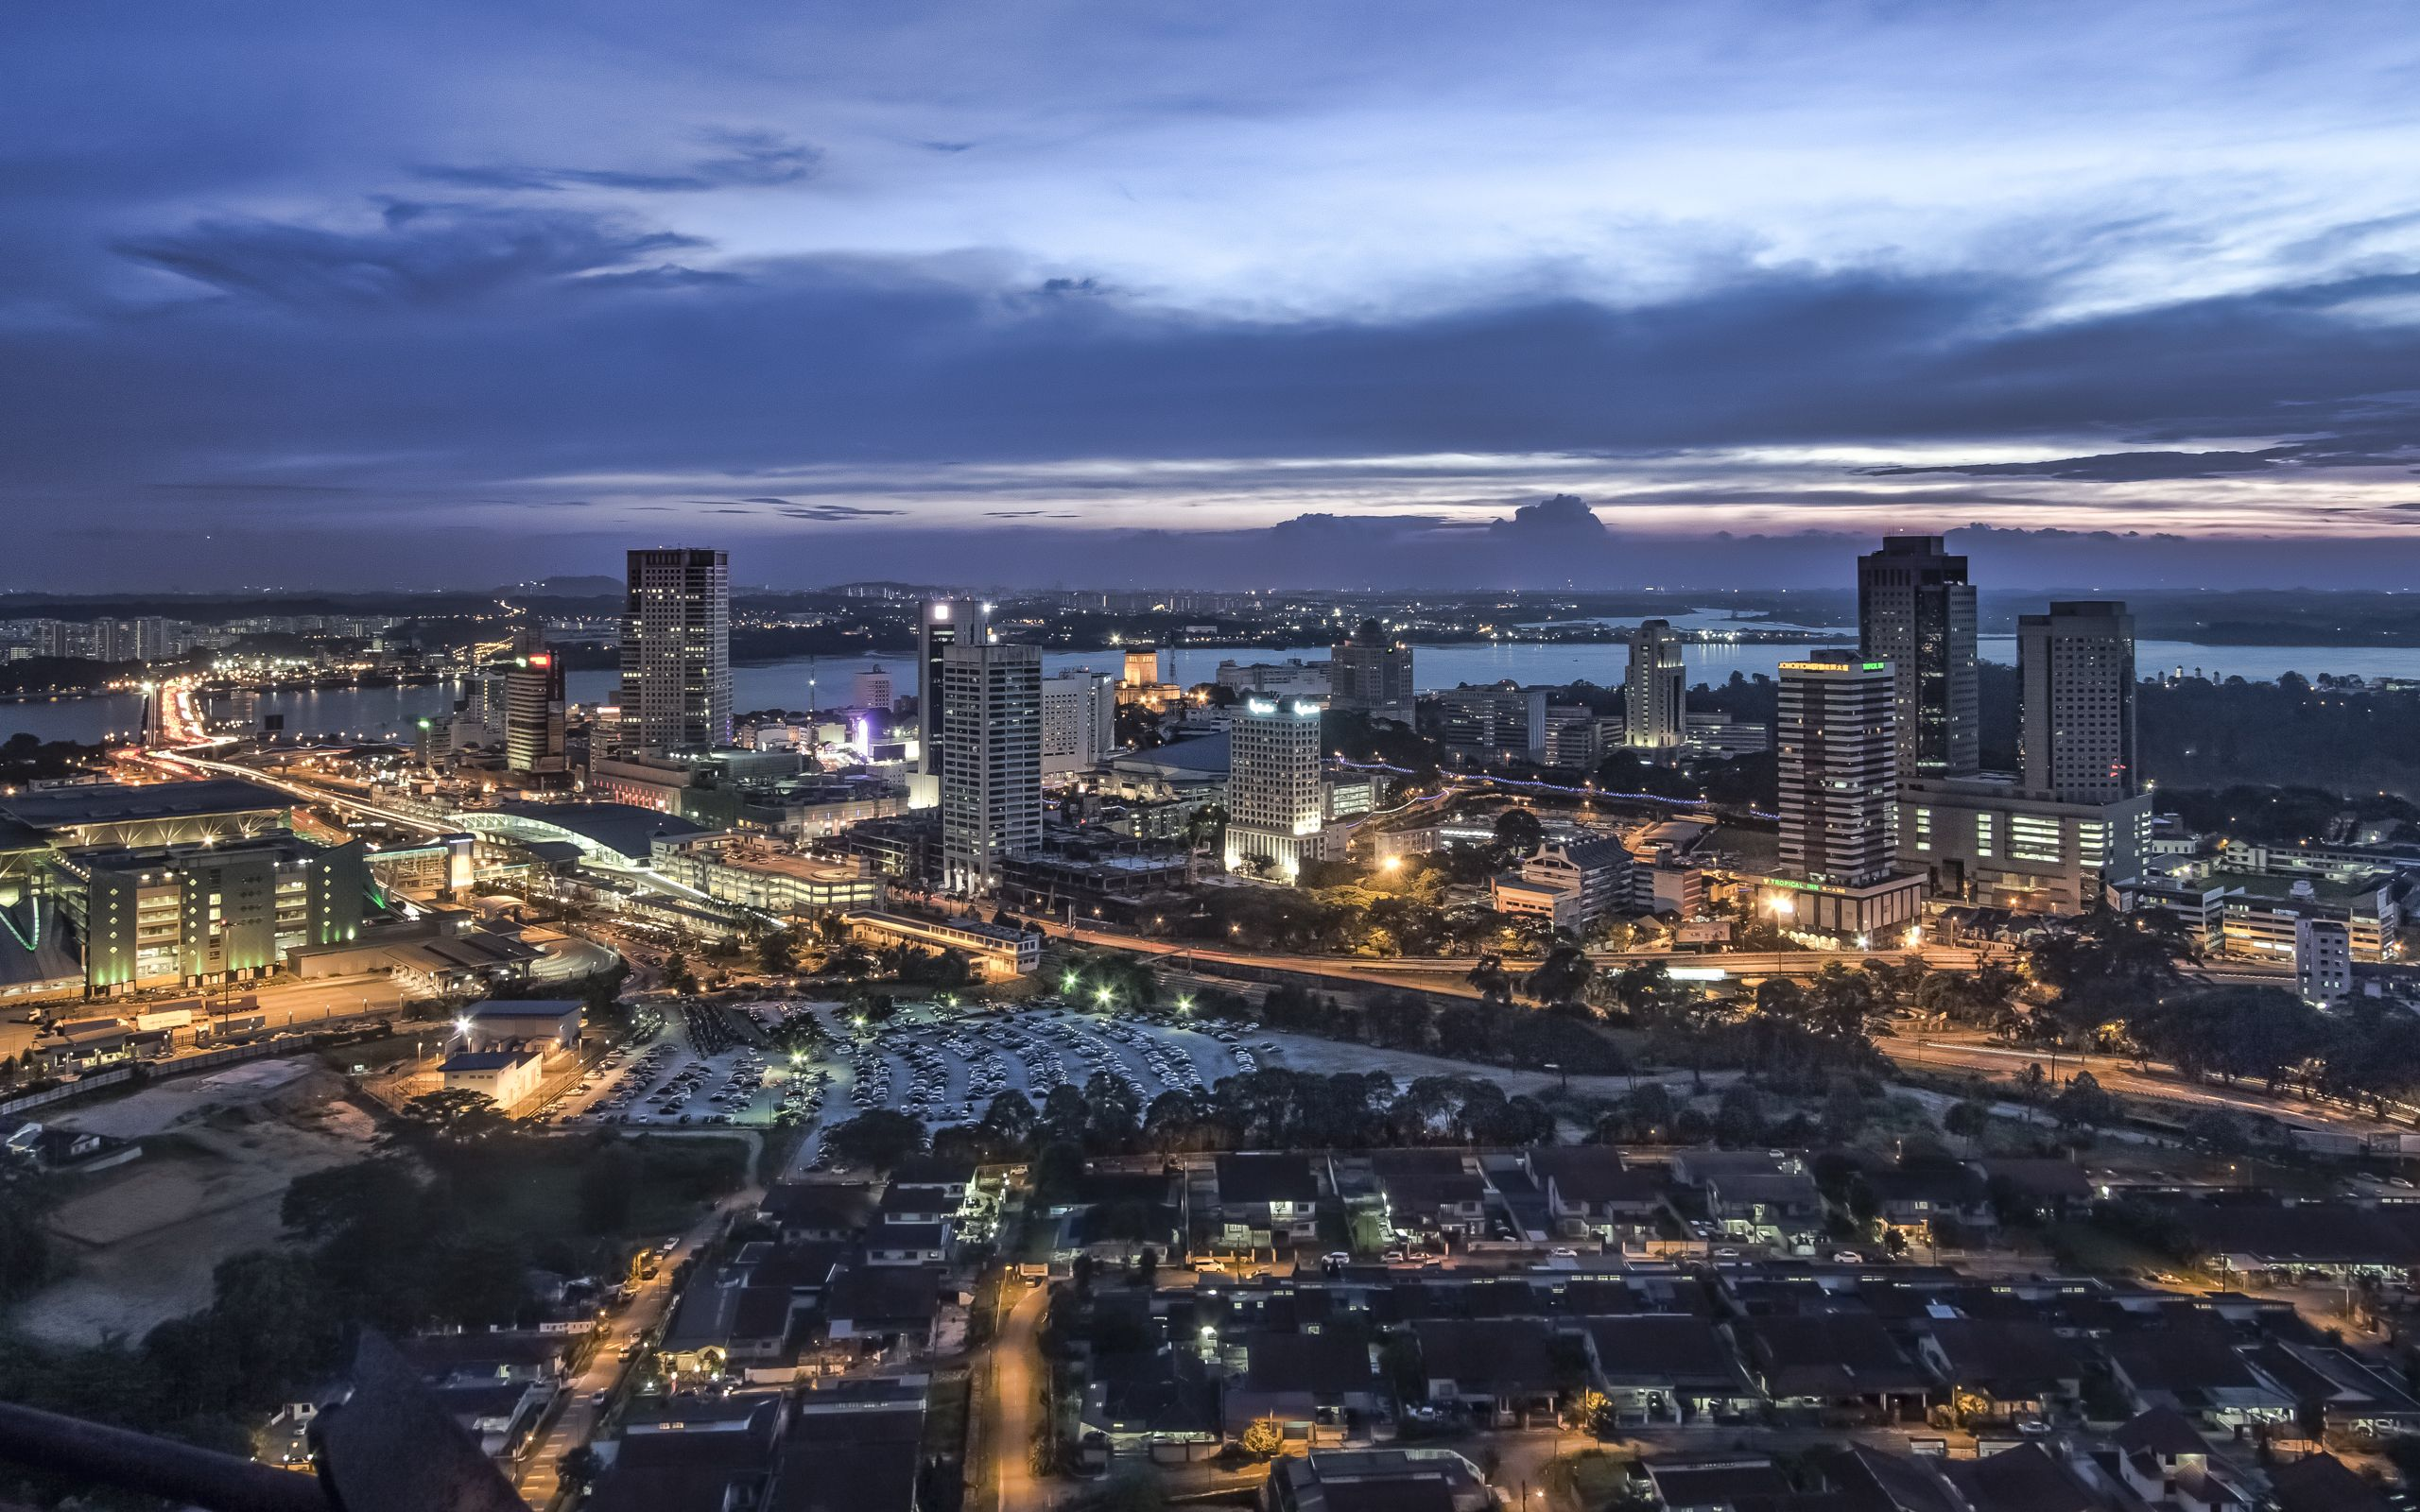 The Johor Bahru Skyline Plenty Of Bus Trips Every Day From